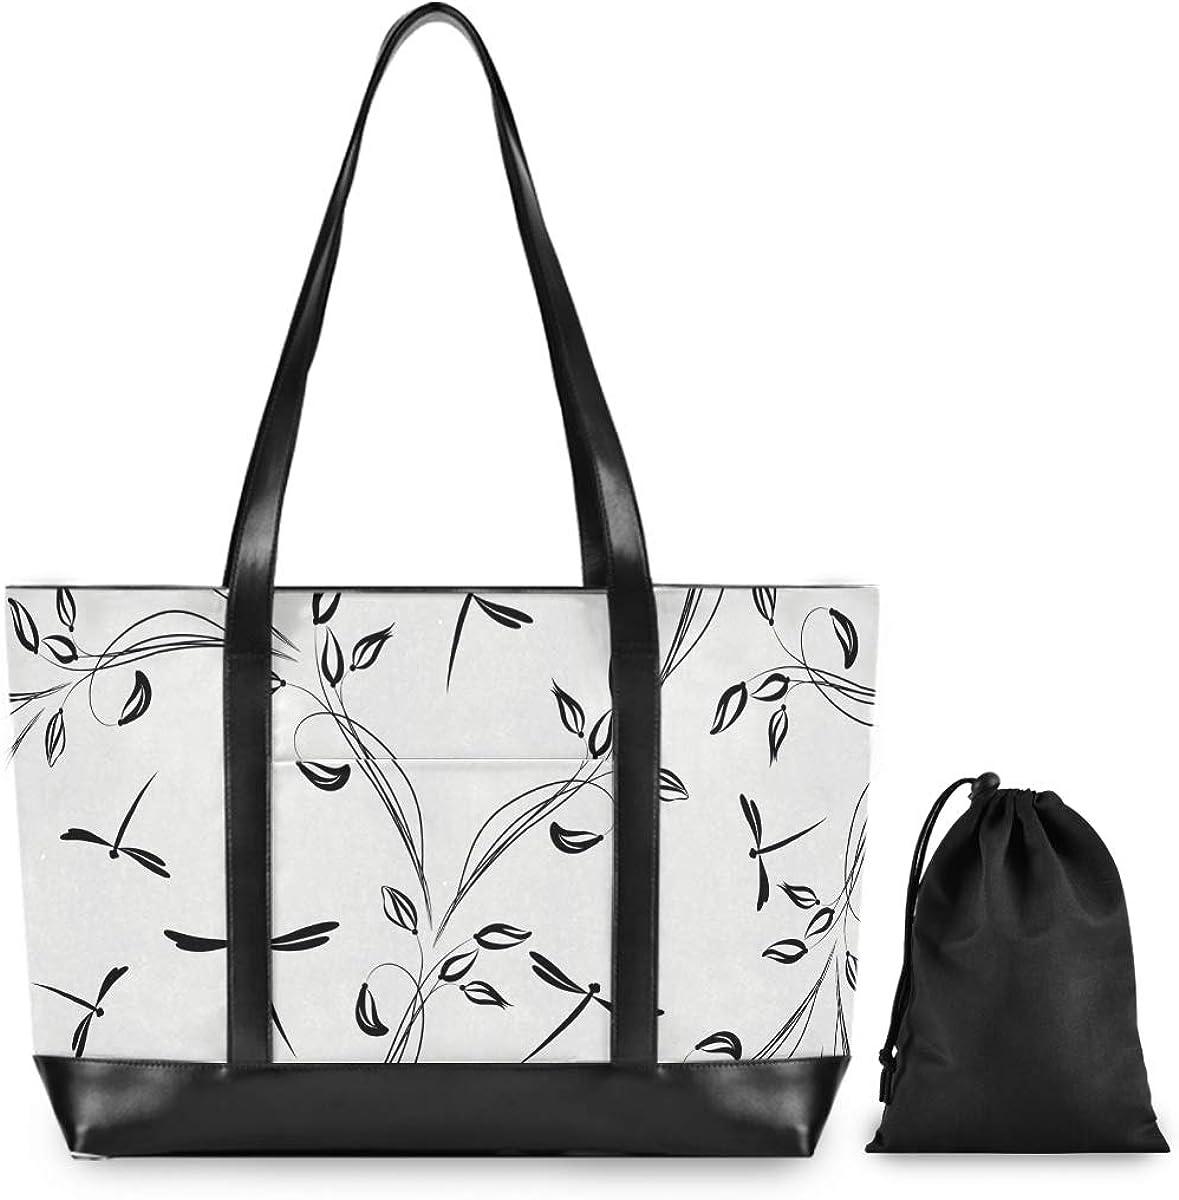 FANTAZIO Veteran US Laptop Tote Bag Fits 15.6 Inch Laptop Womens Lightweight Canvas Tote Bag Shoulder Bag